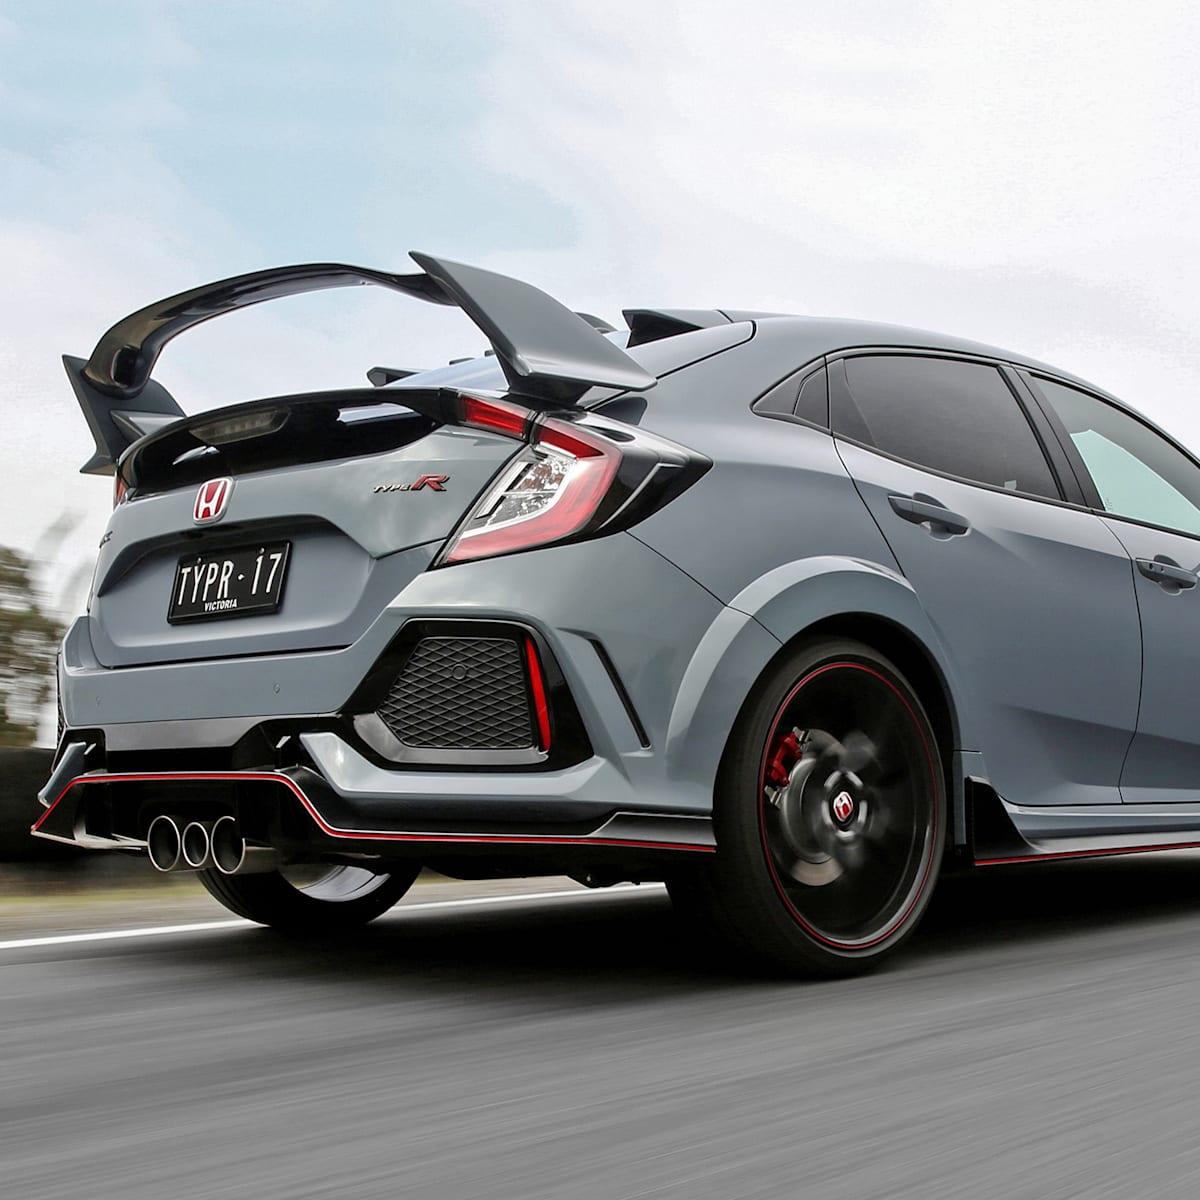 Kelebihan Harga Honda Civic Type R 2019 Tangguh